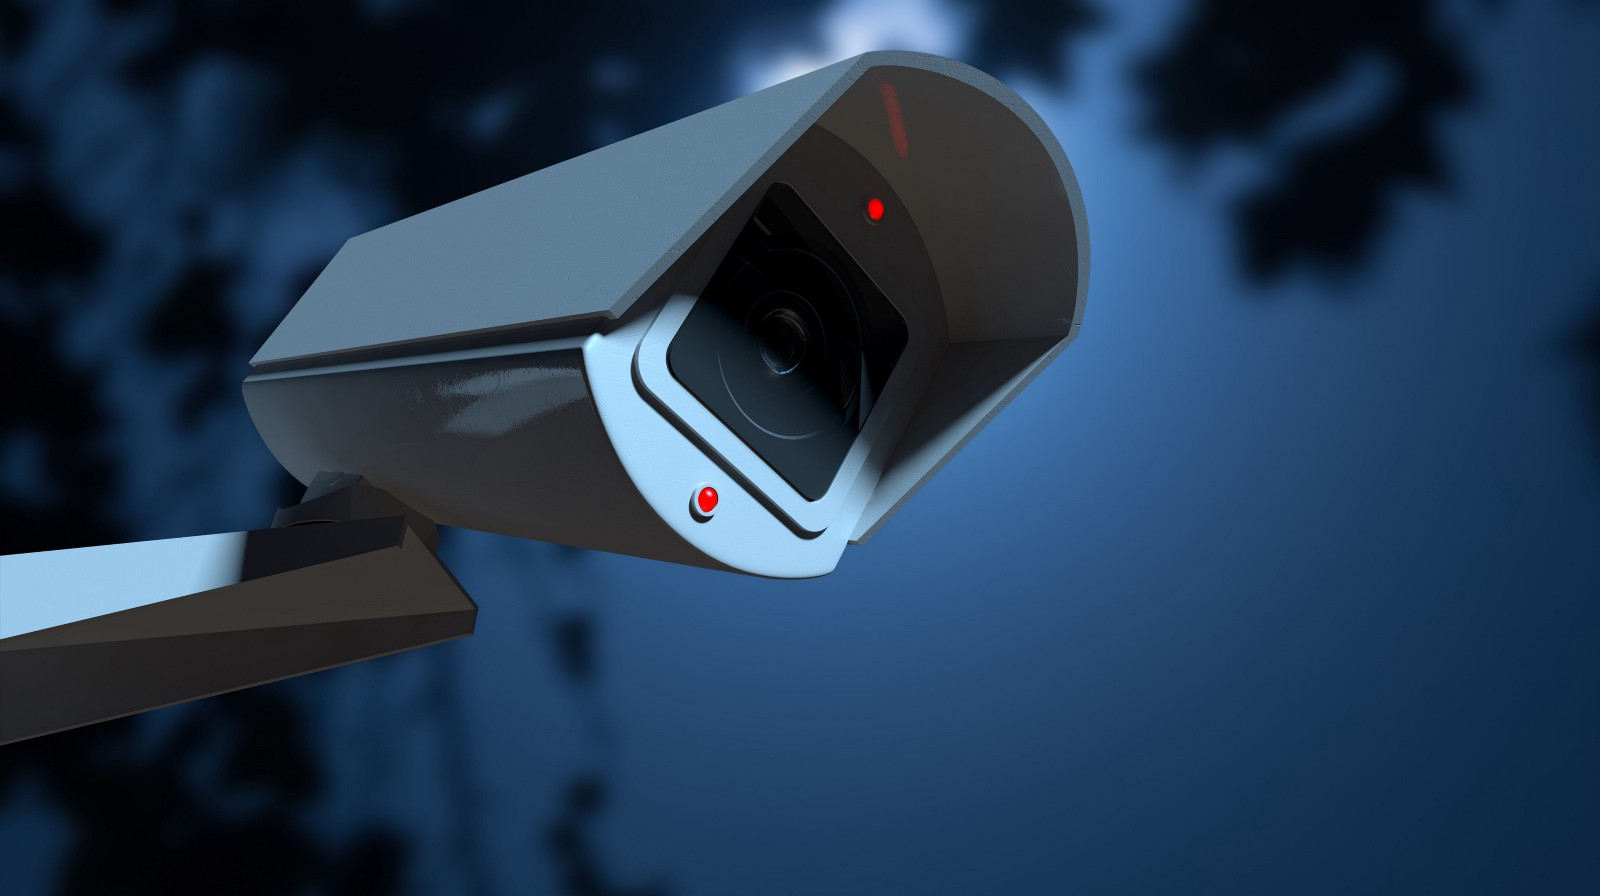 CCTV Camera in Noida